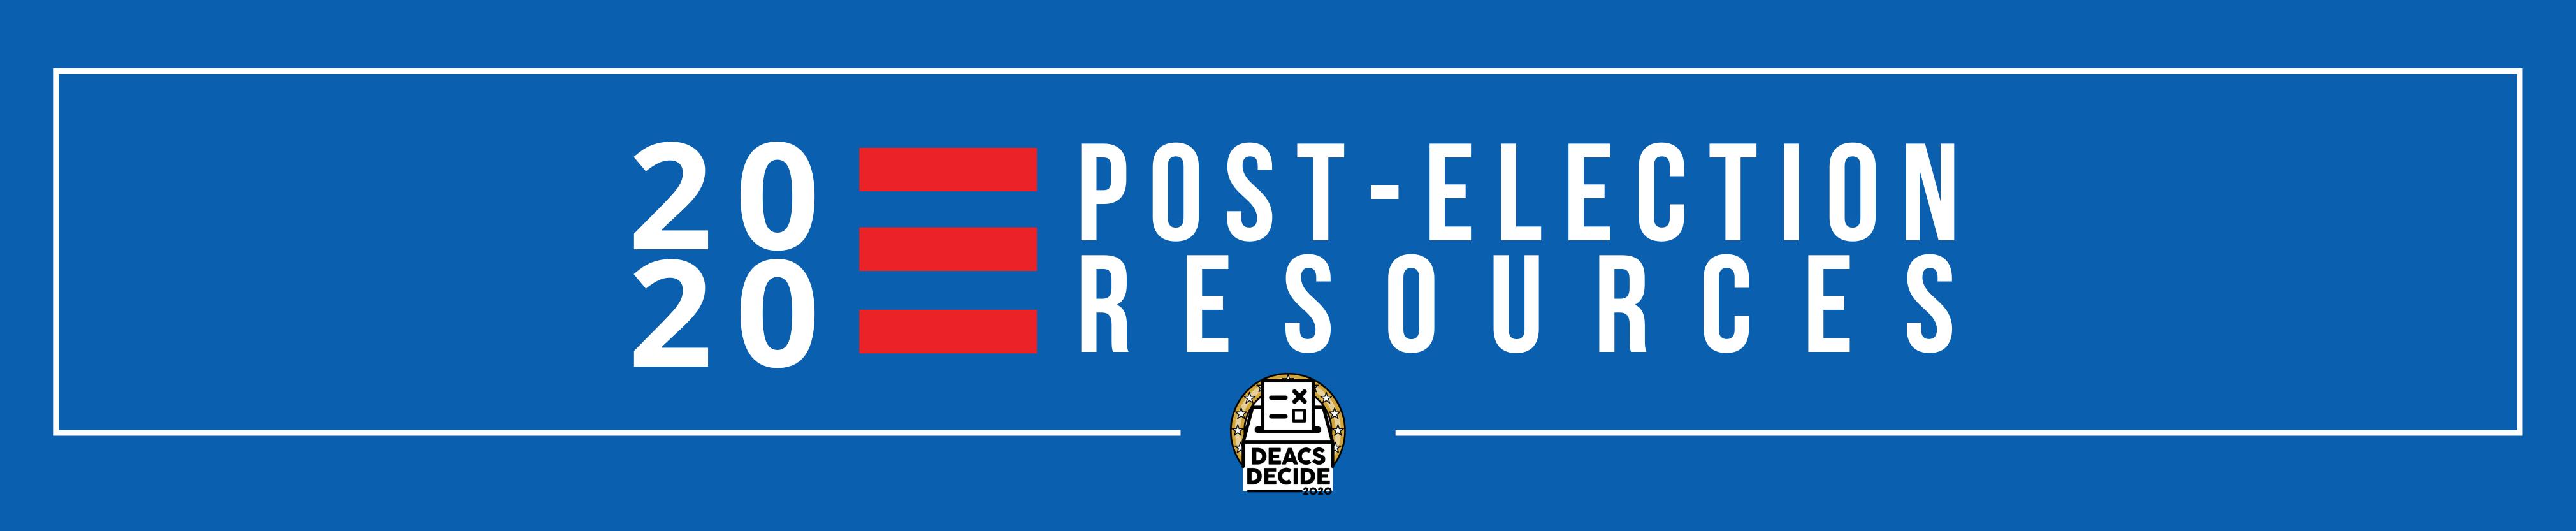 Deacs Decide - Post- Election Resources- Header